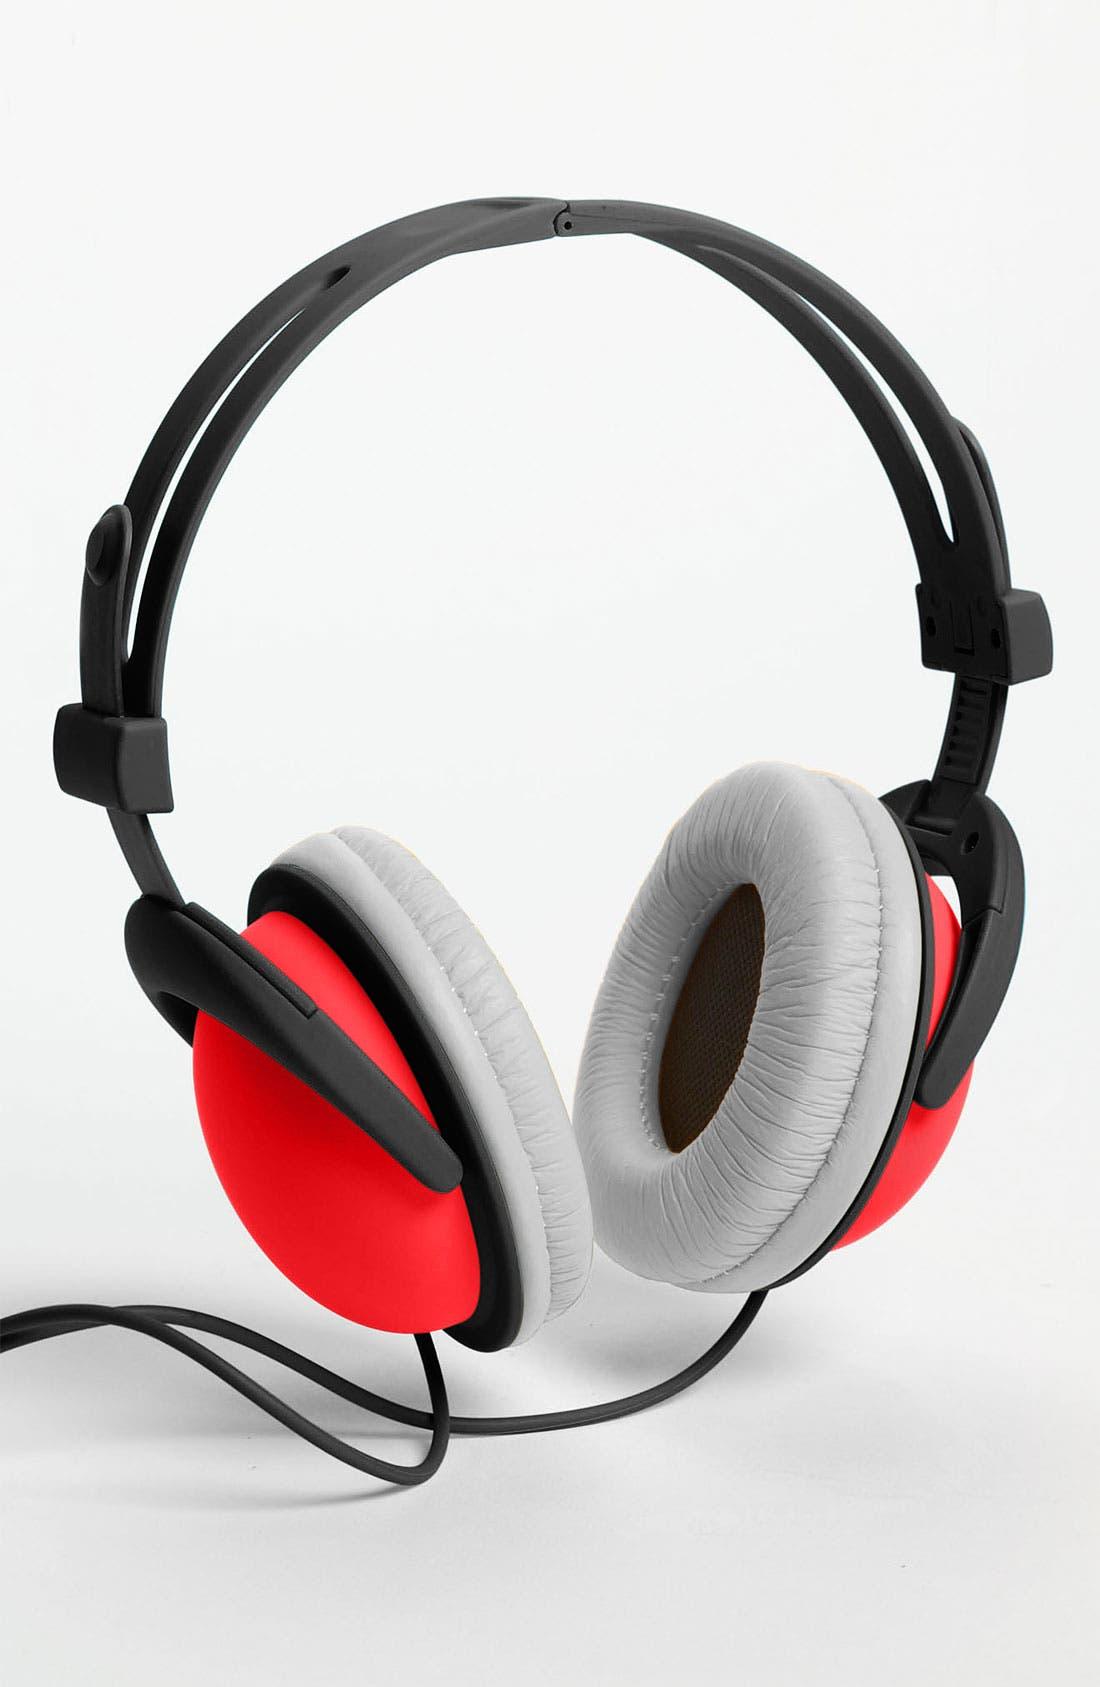 Alternate Image 1 Selected - Decor Craft Colorblock Headphones